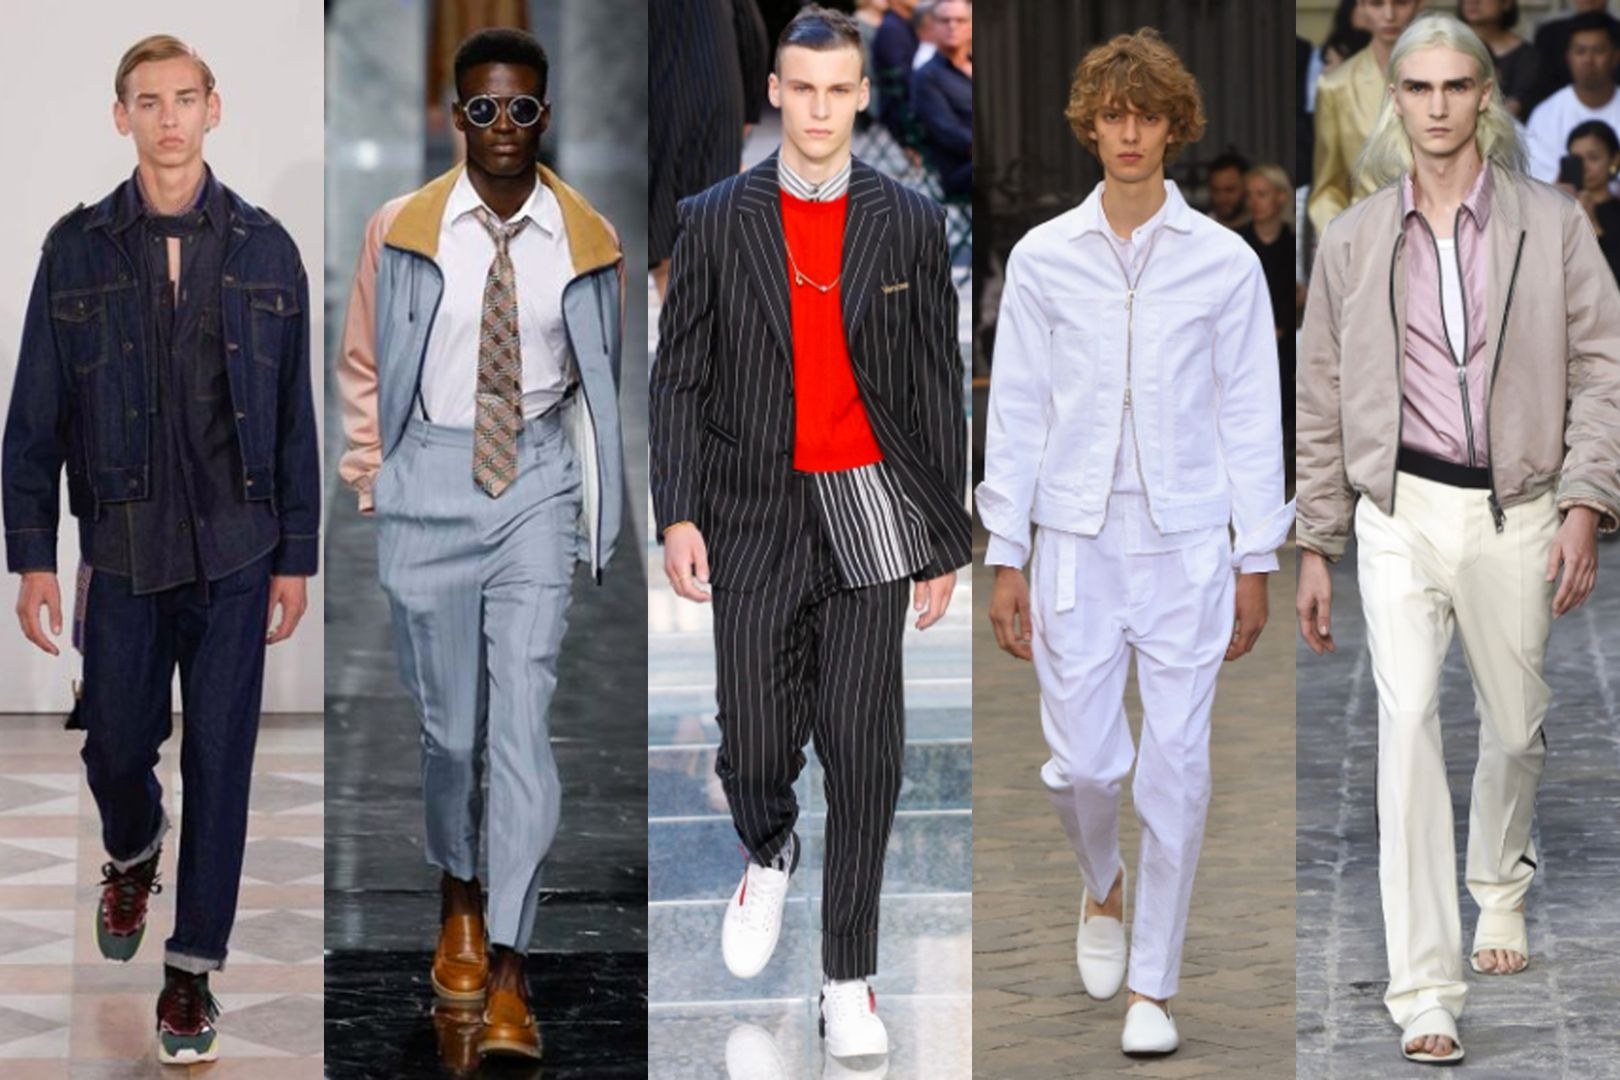 London Fashion Week the Men's S/S 2019